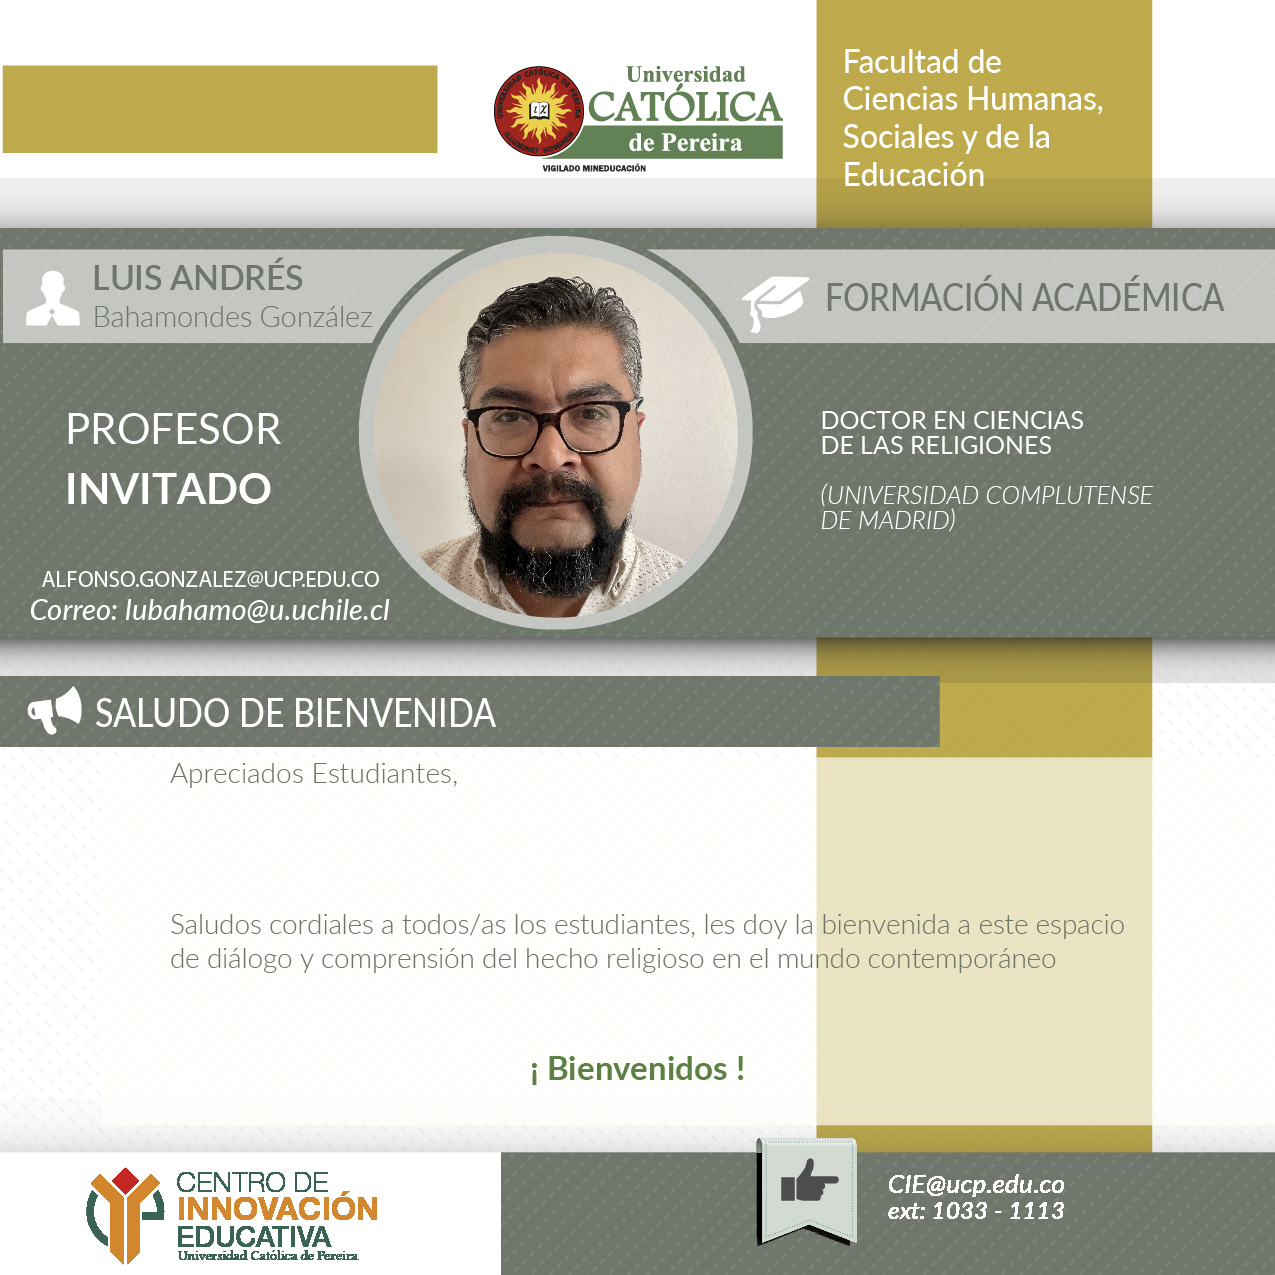 Profesor invitado